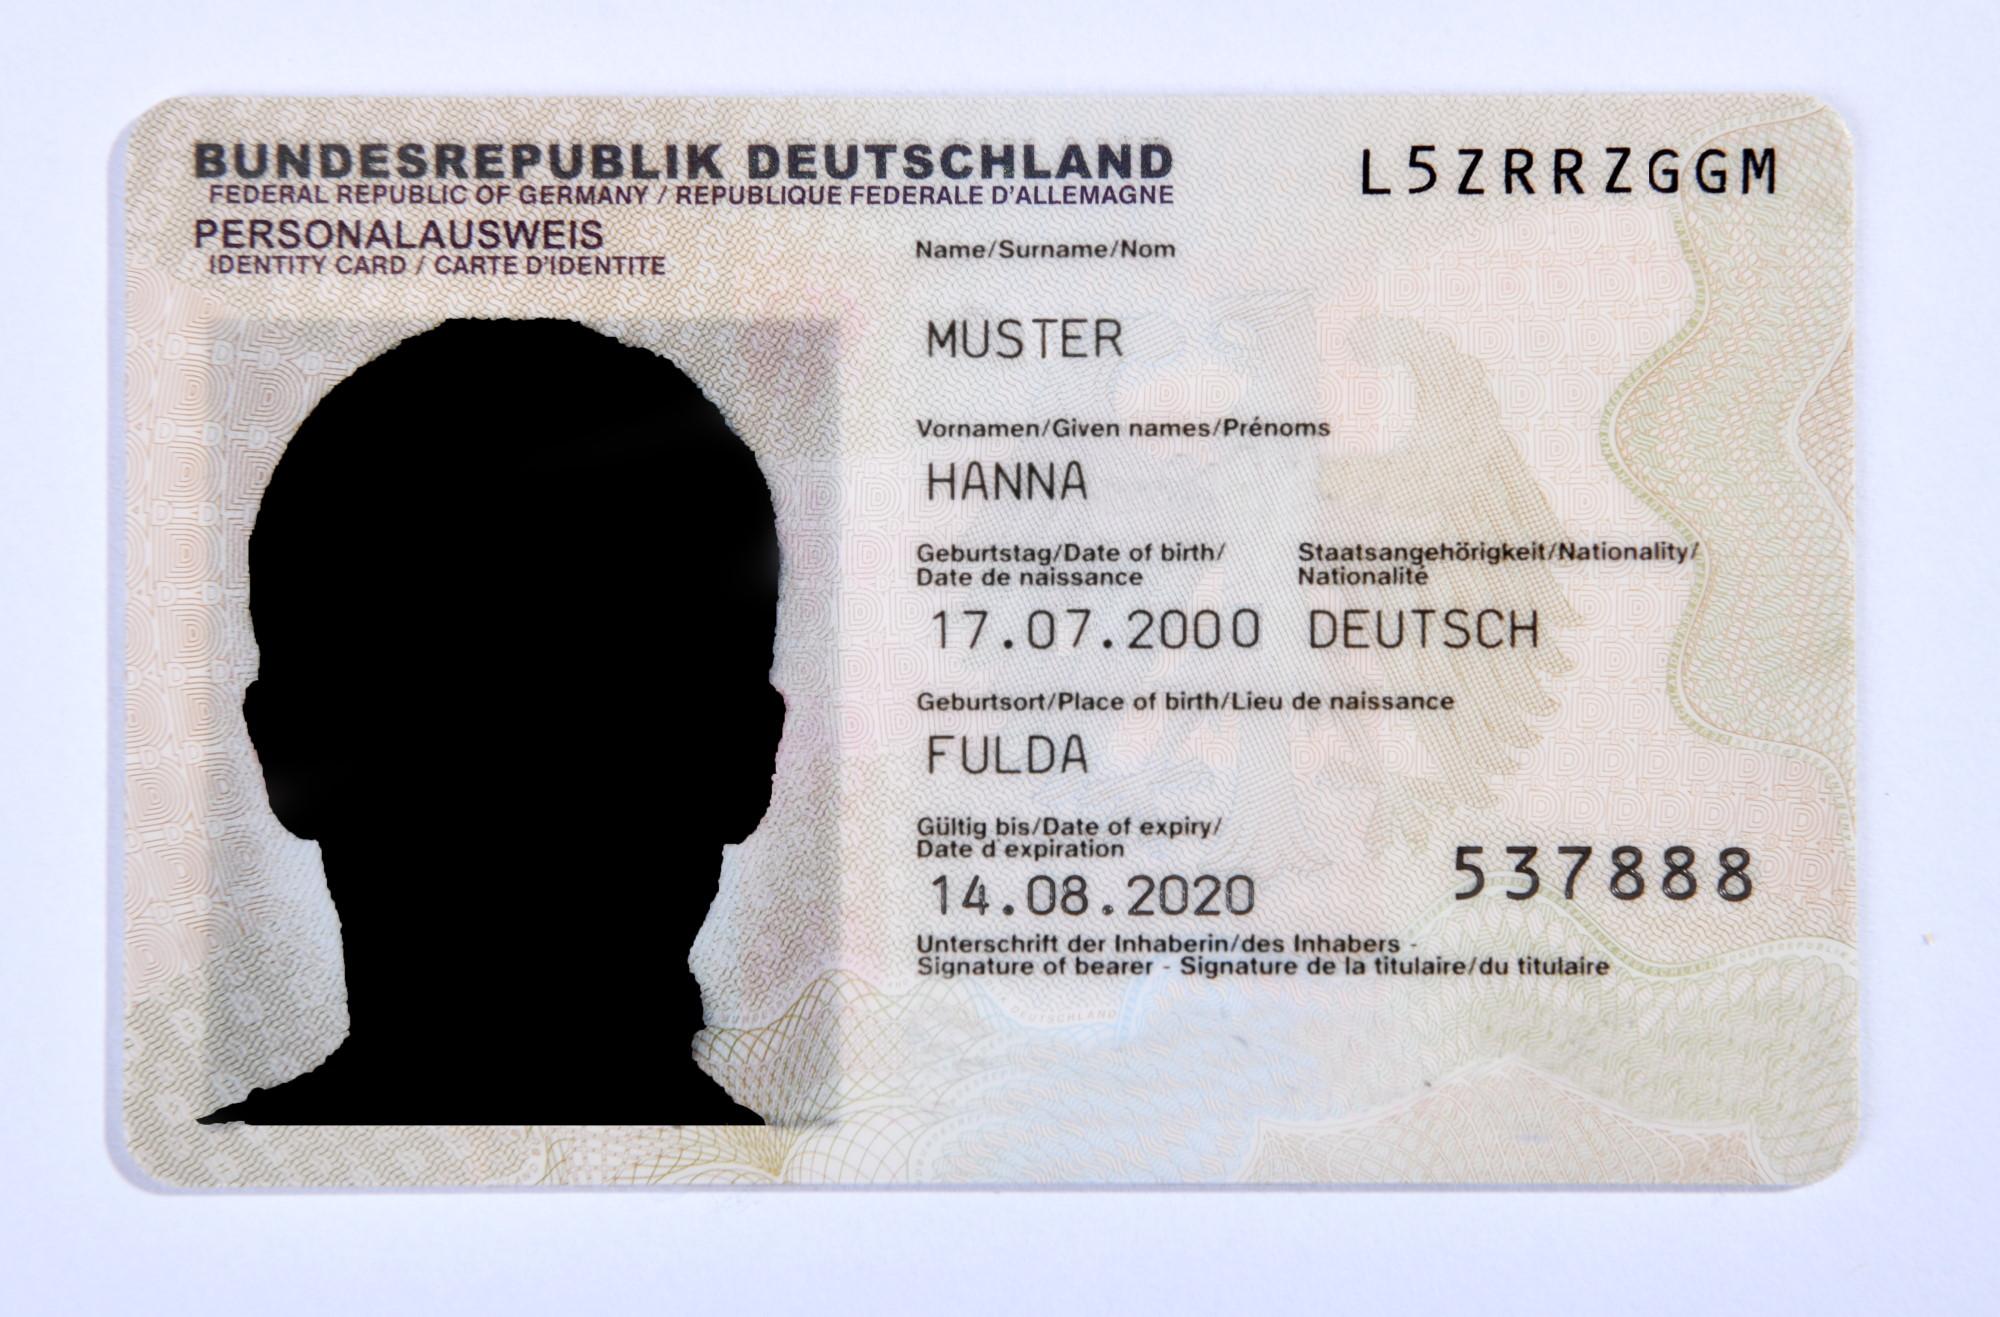 Fulda Leichte Sprache Personal Ausweis